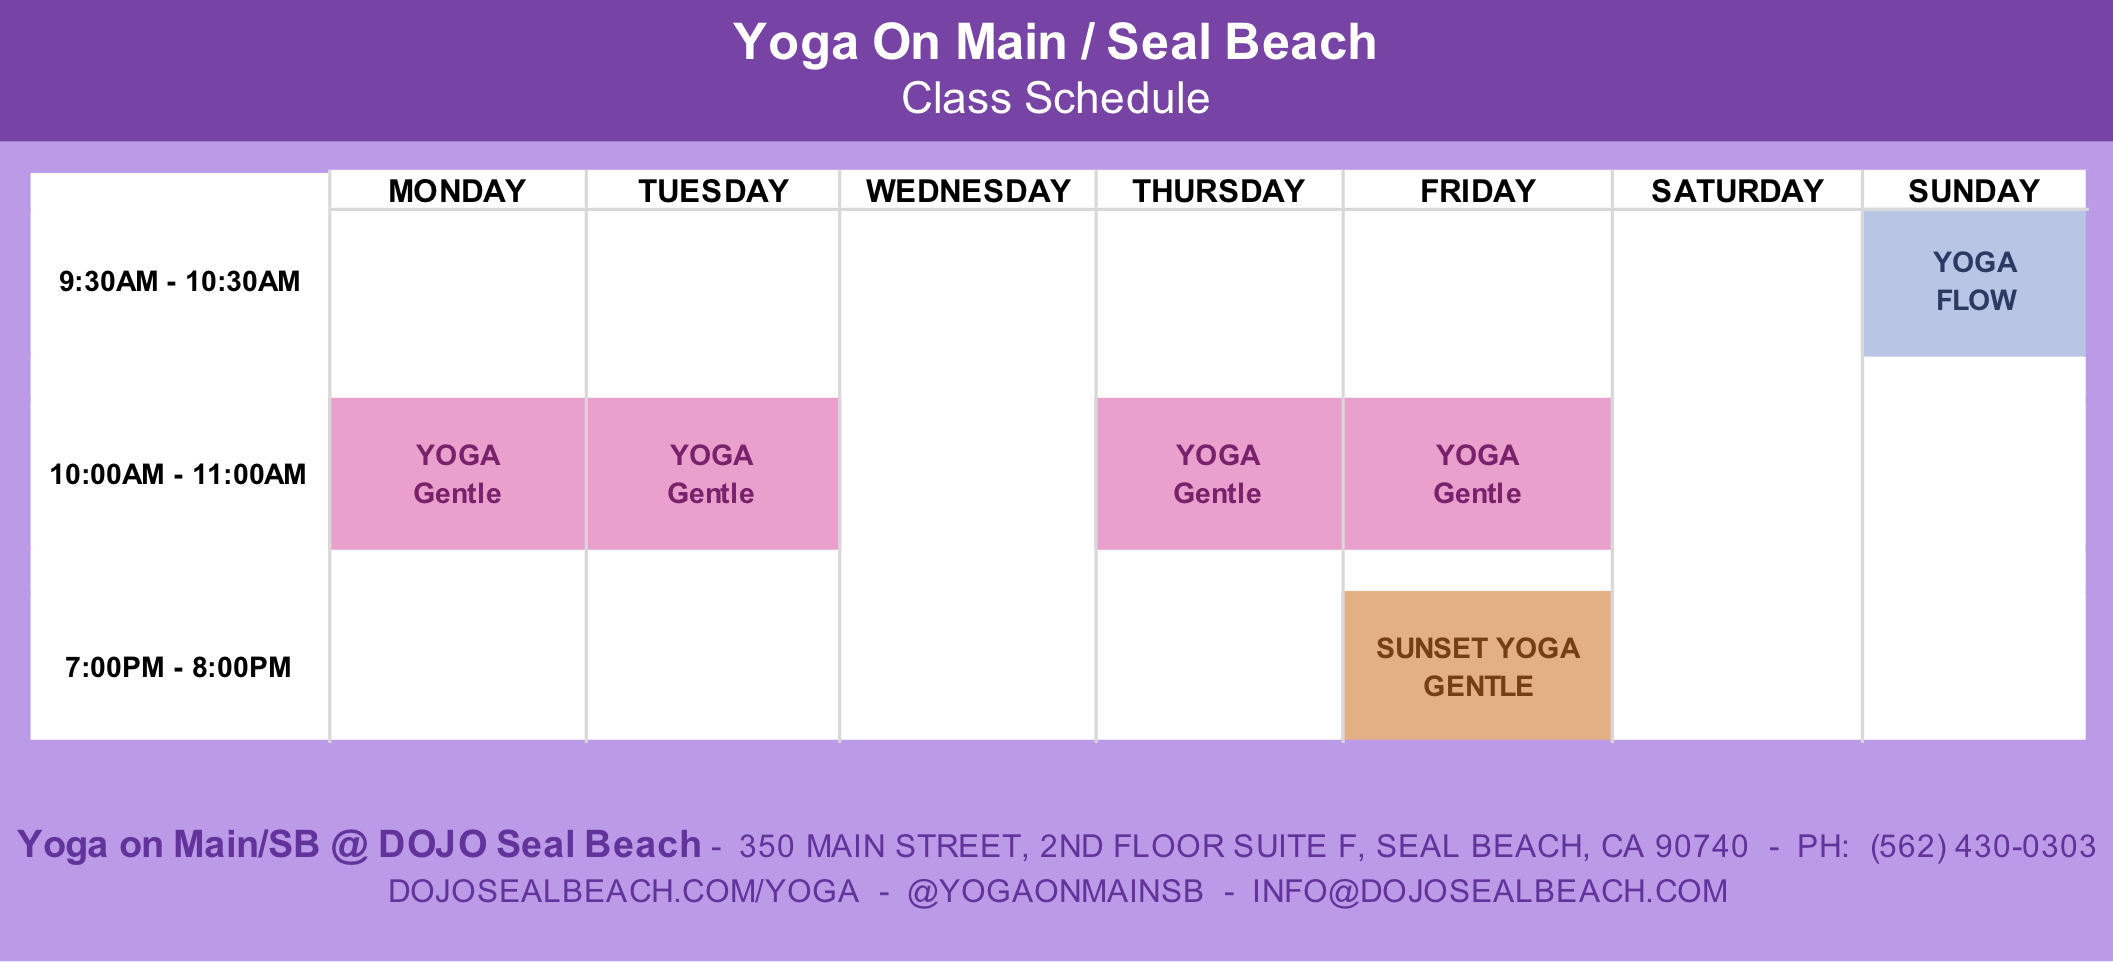 DOJO - Schedule-yoga.jpg